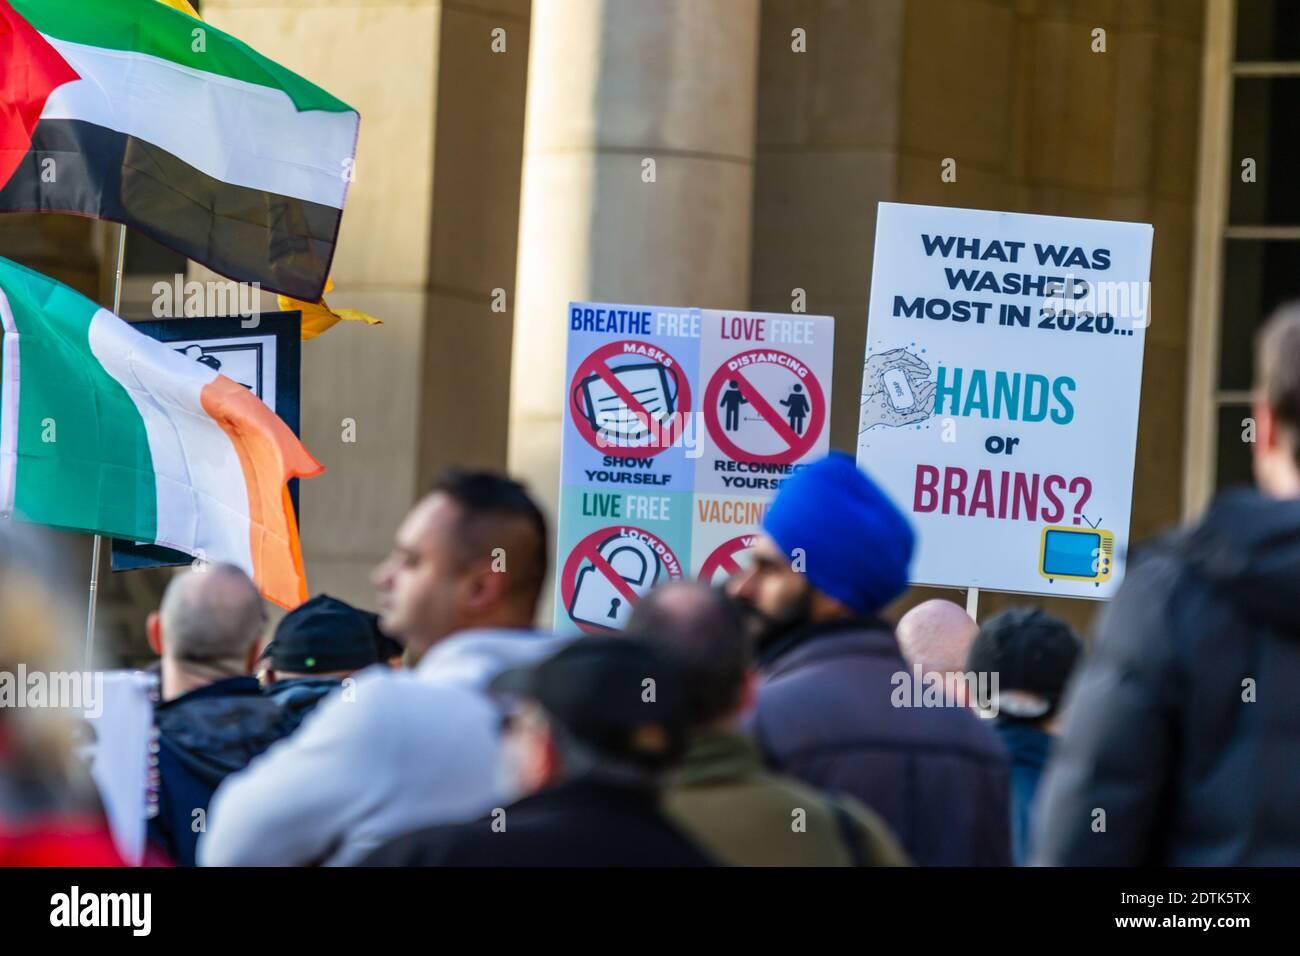 anti-maskers-and-anti-lockdown-protesters-in-birmingham-uk-in-october-2020-2DTK5TX.jpg